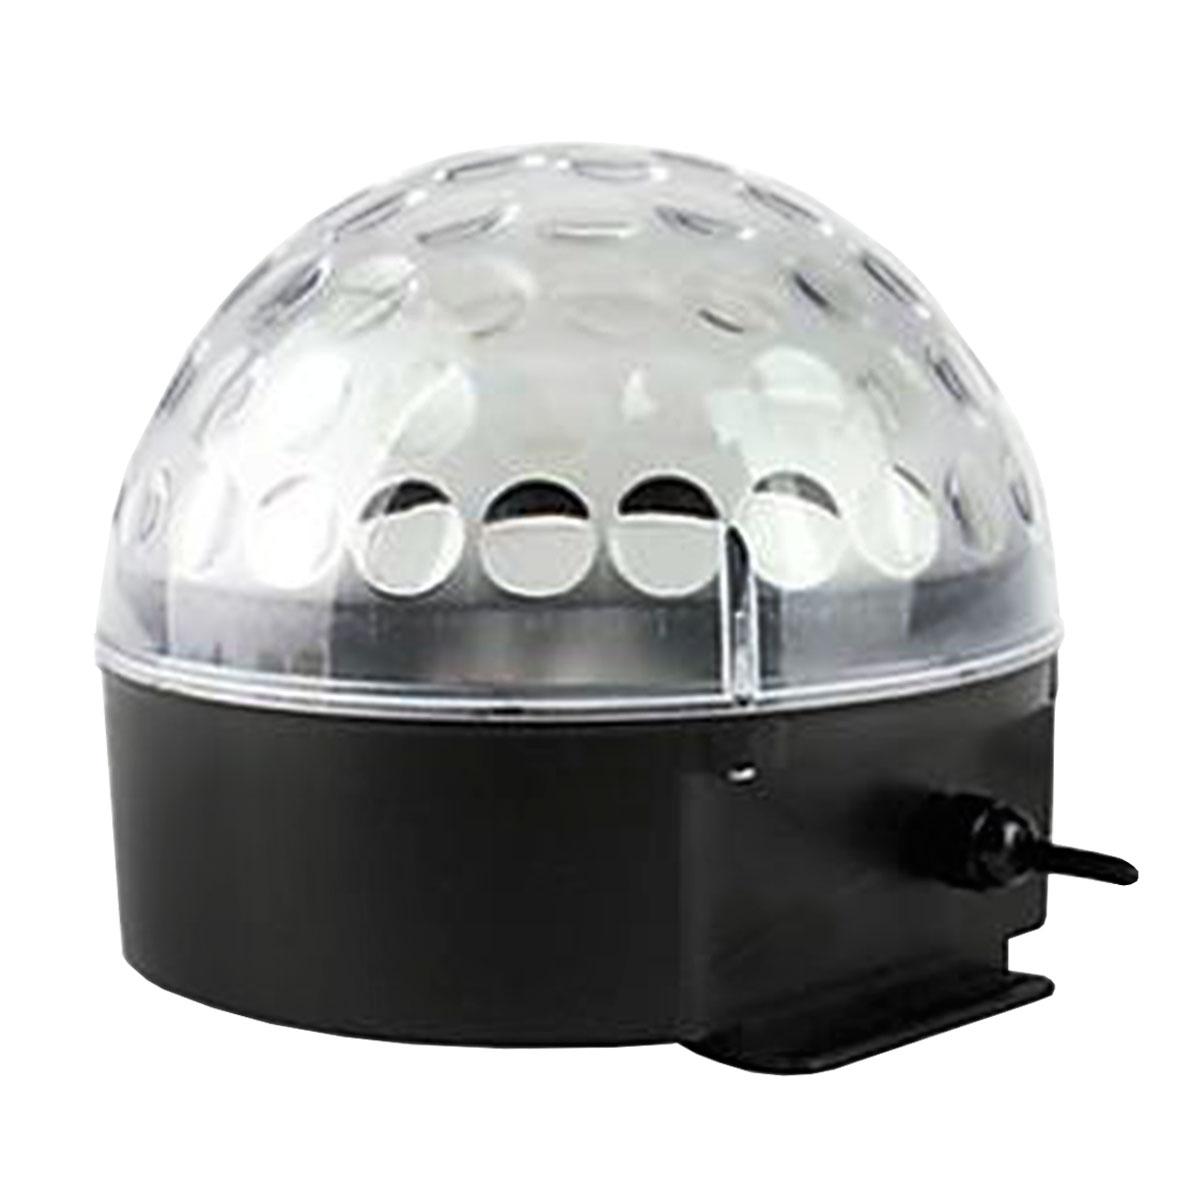 SP143 - Meia Bola de LED RGB SP 143 - Spectrum